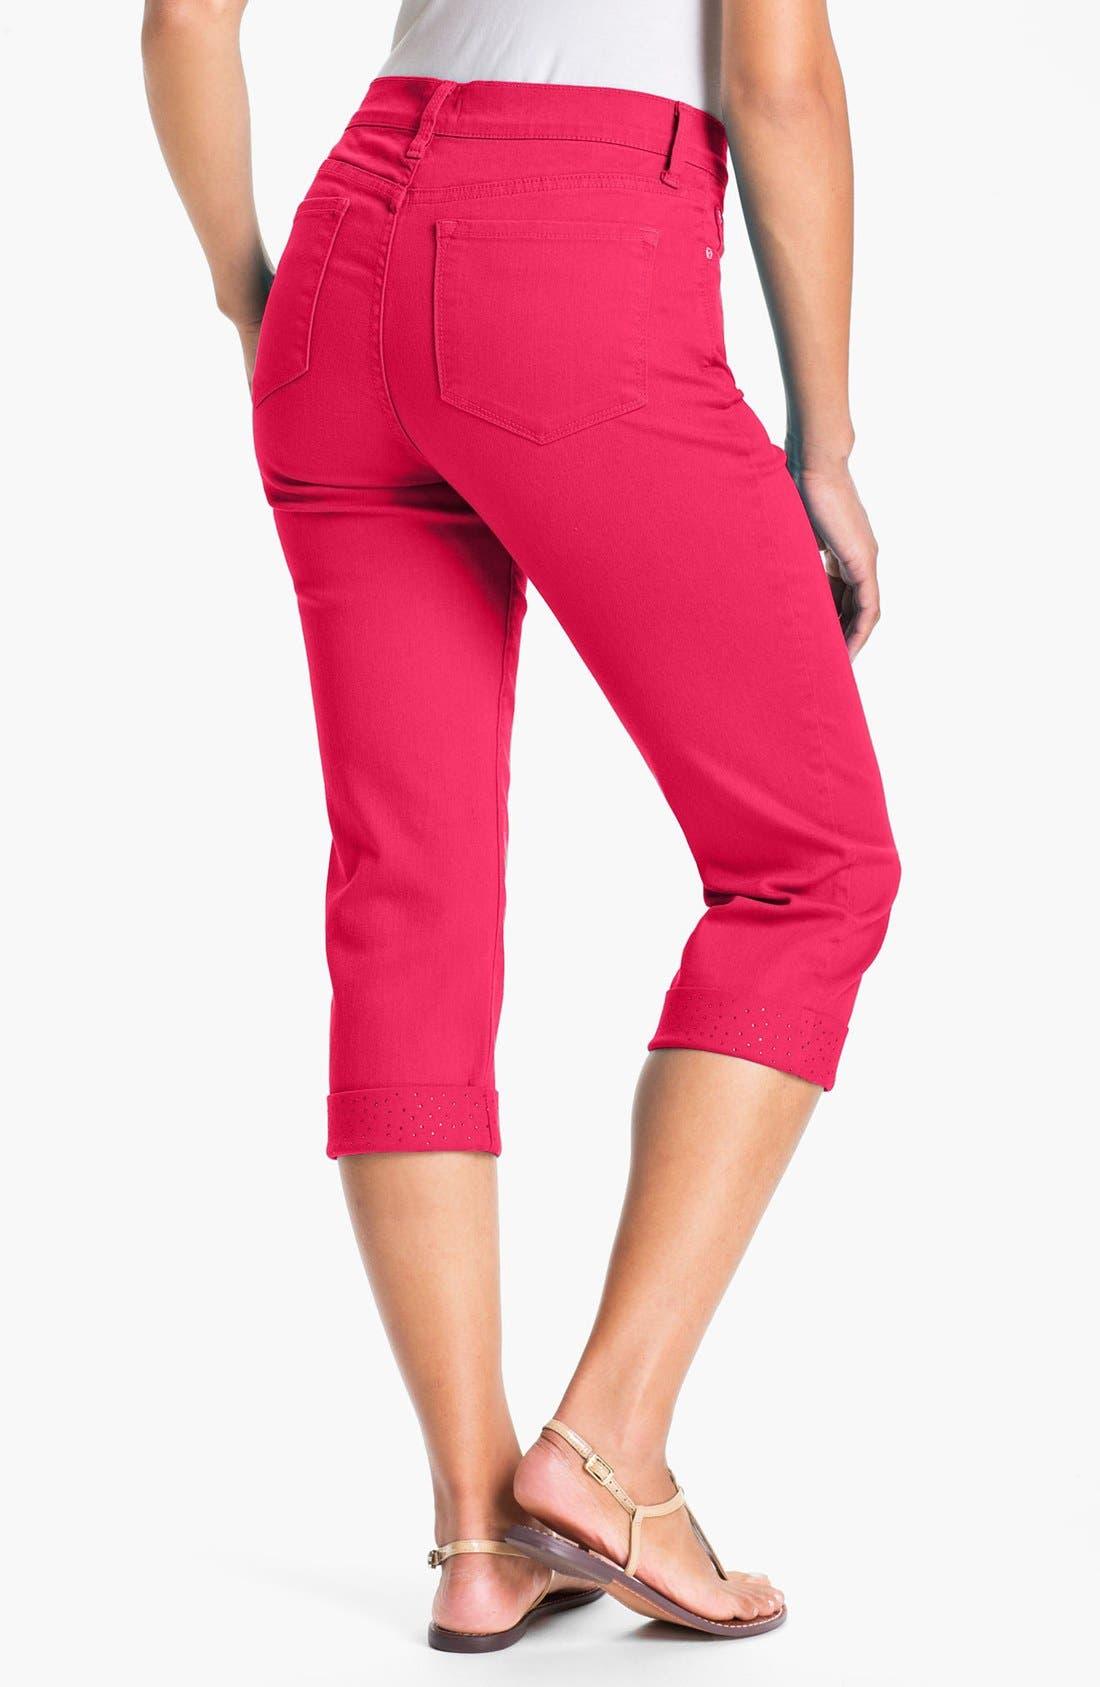 Alternate Image 2  - NYDJ 'Alyssia' Embellished Crop Jeans (Petite)